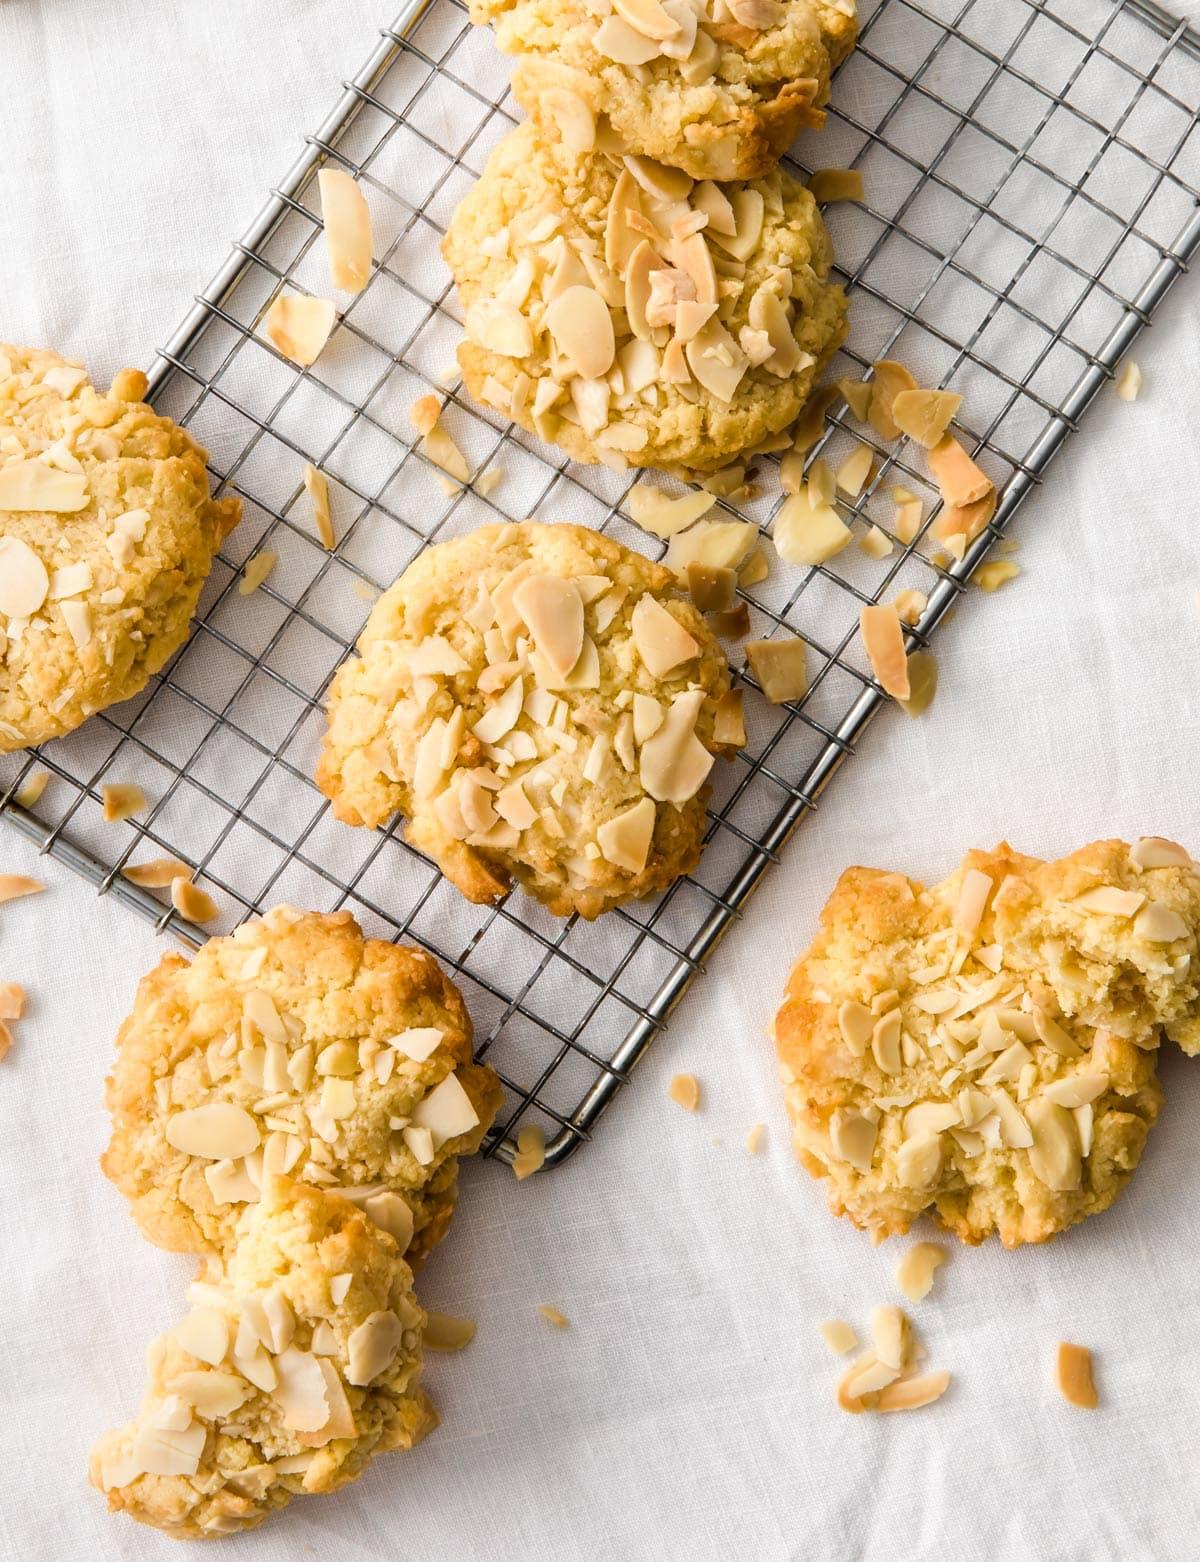 sugar free oatmeal cookies on a metal cooling rack